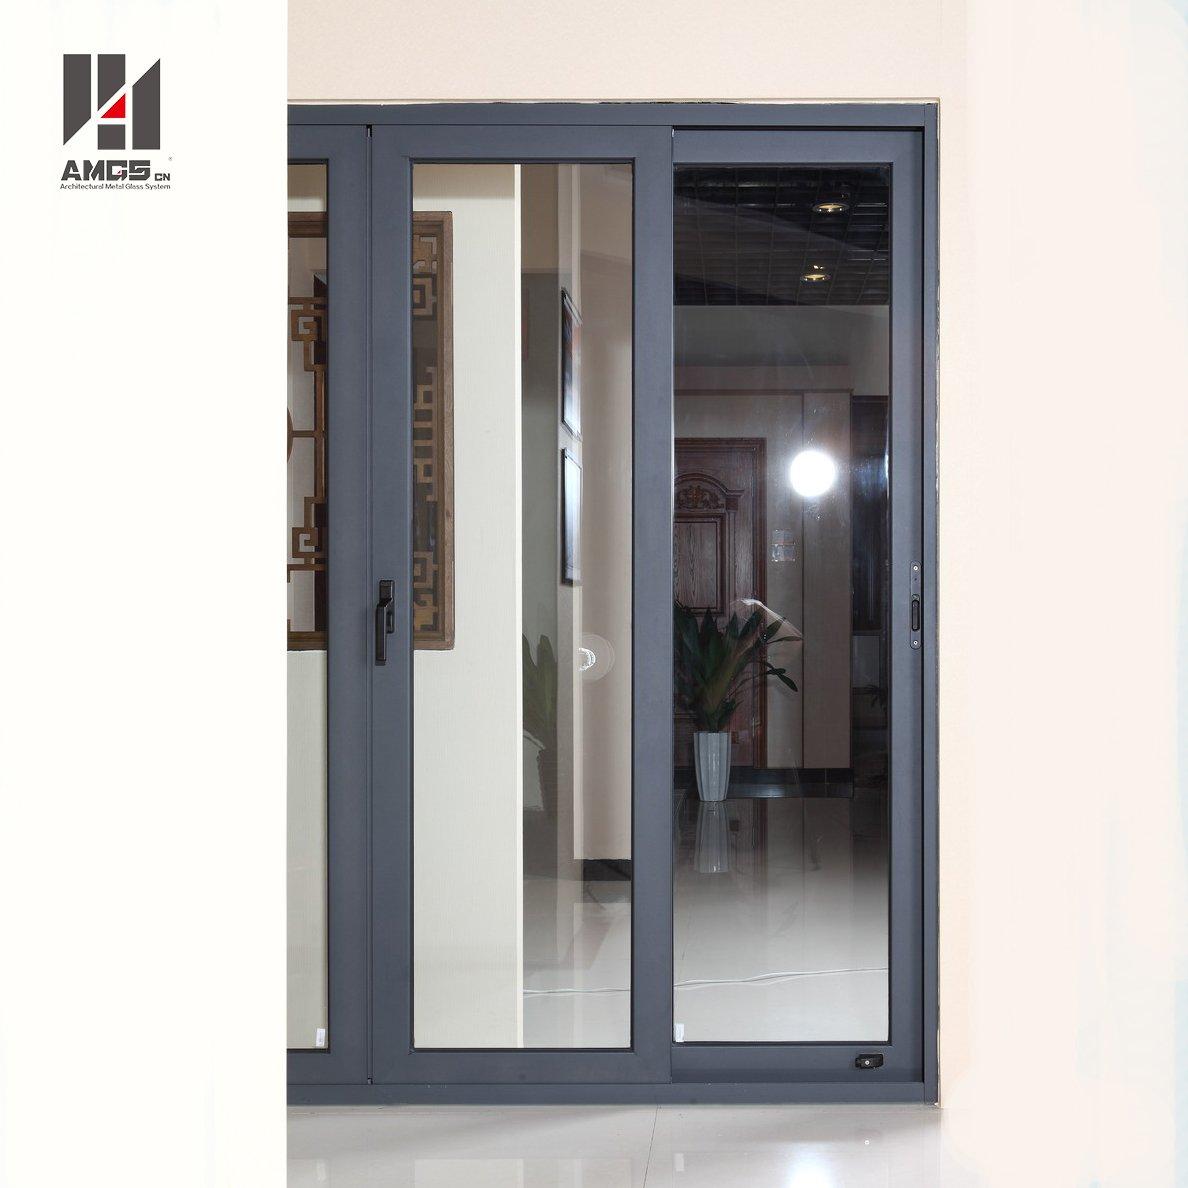 AMGS Exterior Balcony Aluminium Profiles Large Sliding Glass Doors Aluminum Sliding Doors image8